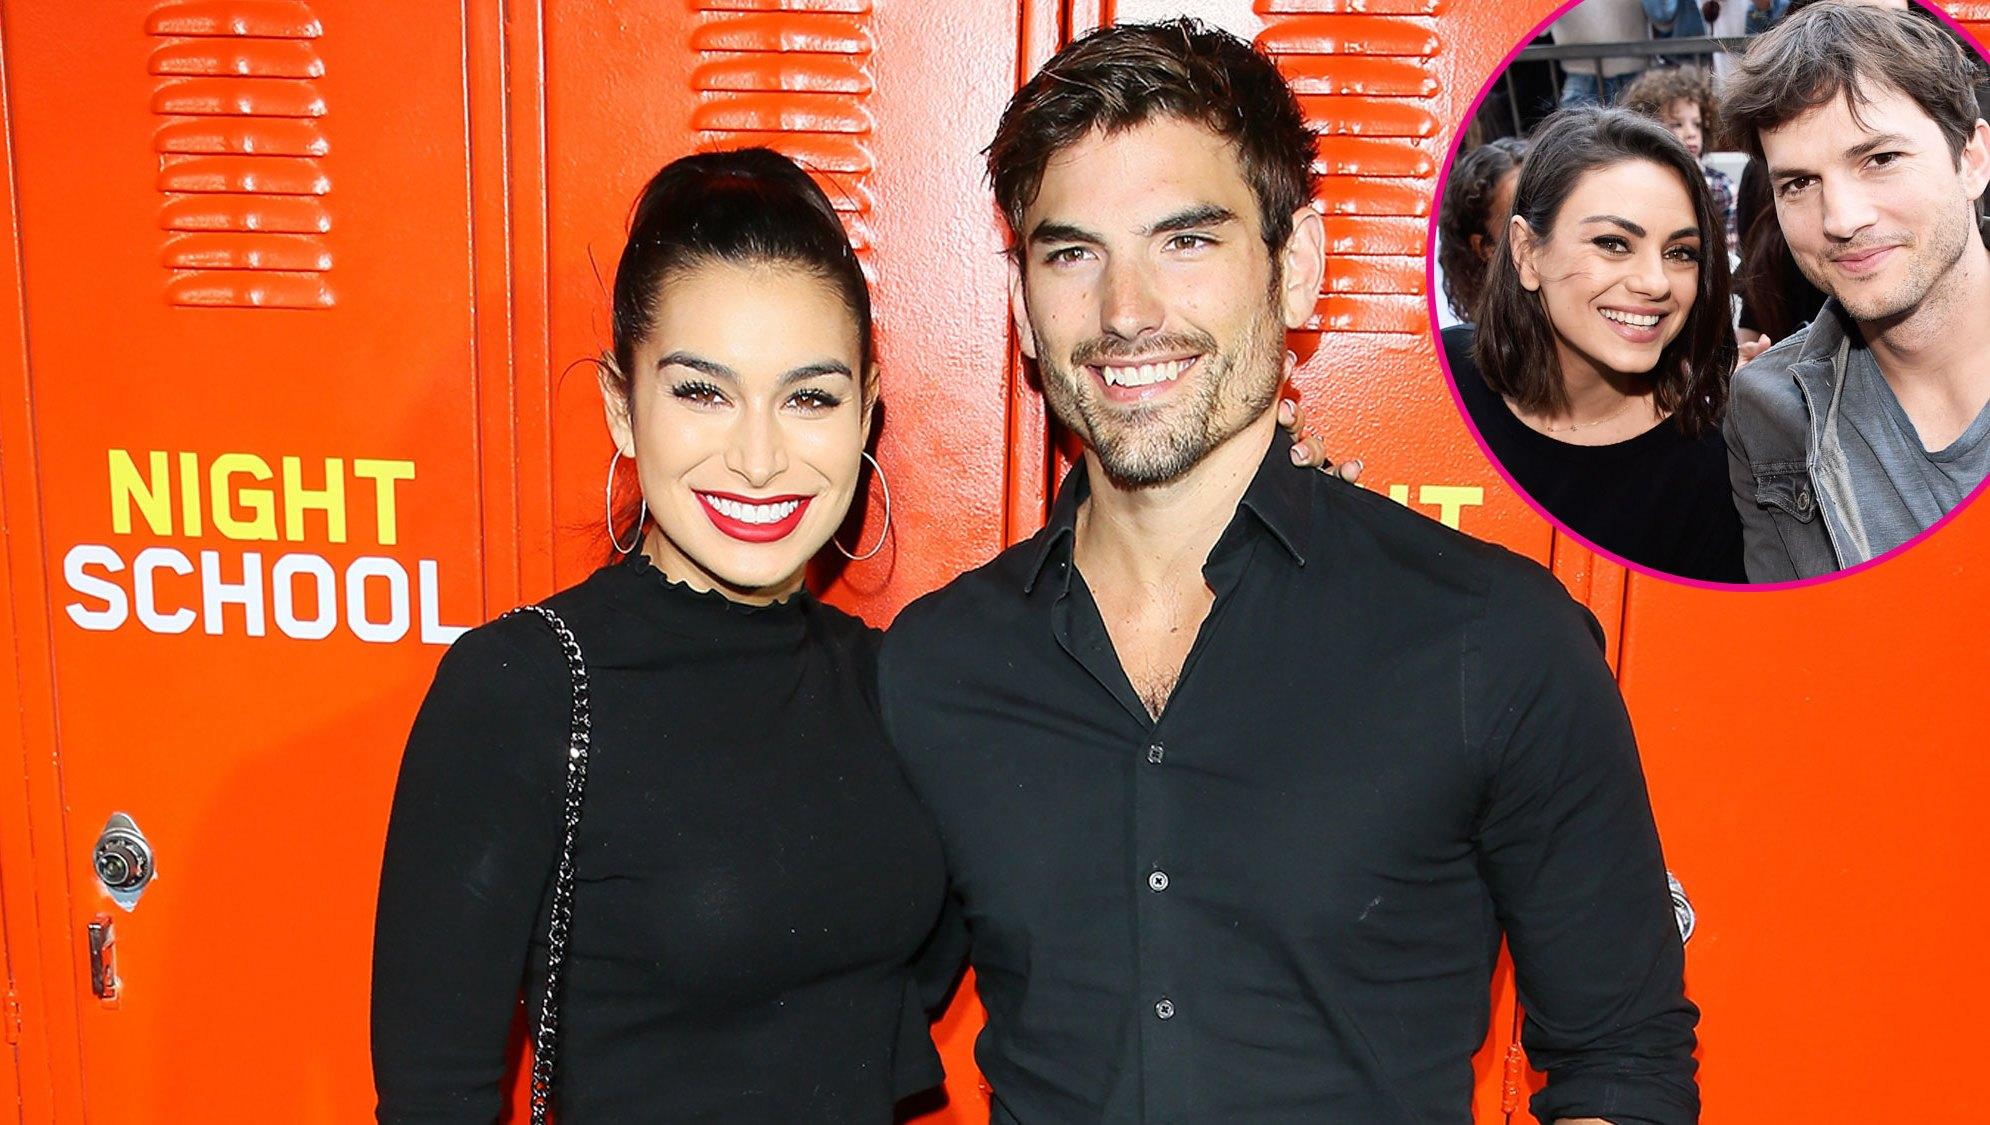 Ashley Iaconetti and Jared Haibon with Ashton Kutcher and Mila Kunis